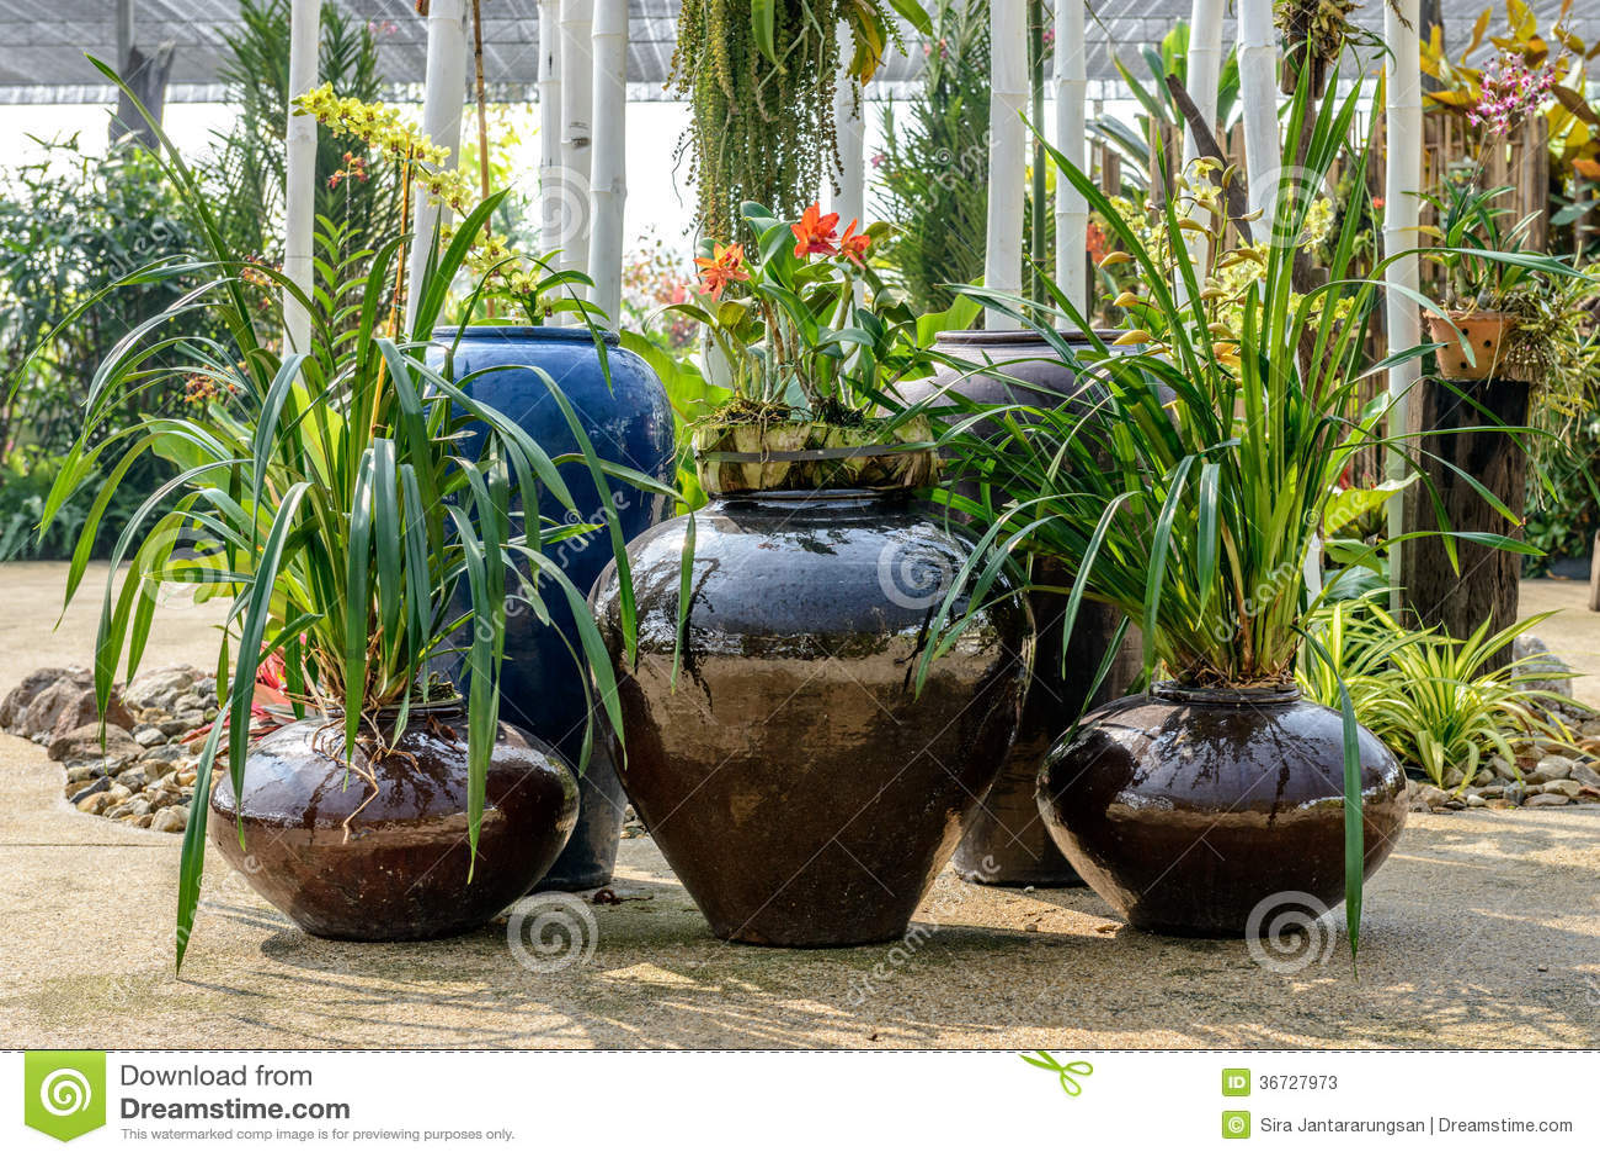 poterie de terre dans le jardin photos stock image 36727973. Black Bedroom Furniture Sets. Home Design Ideas